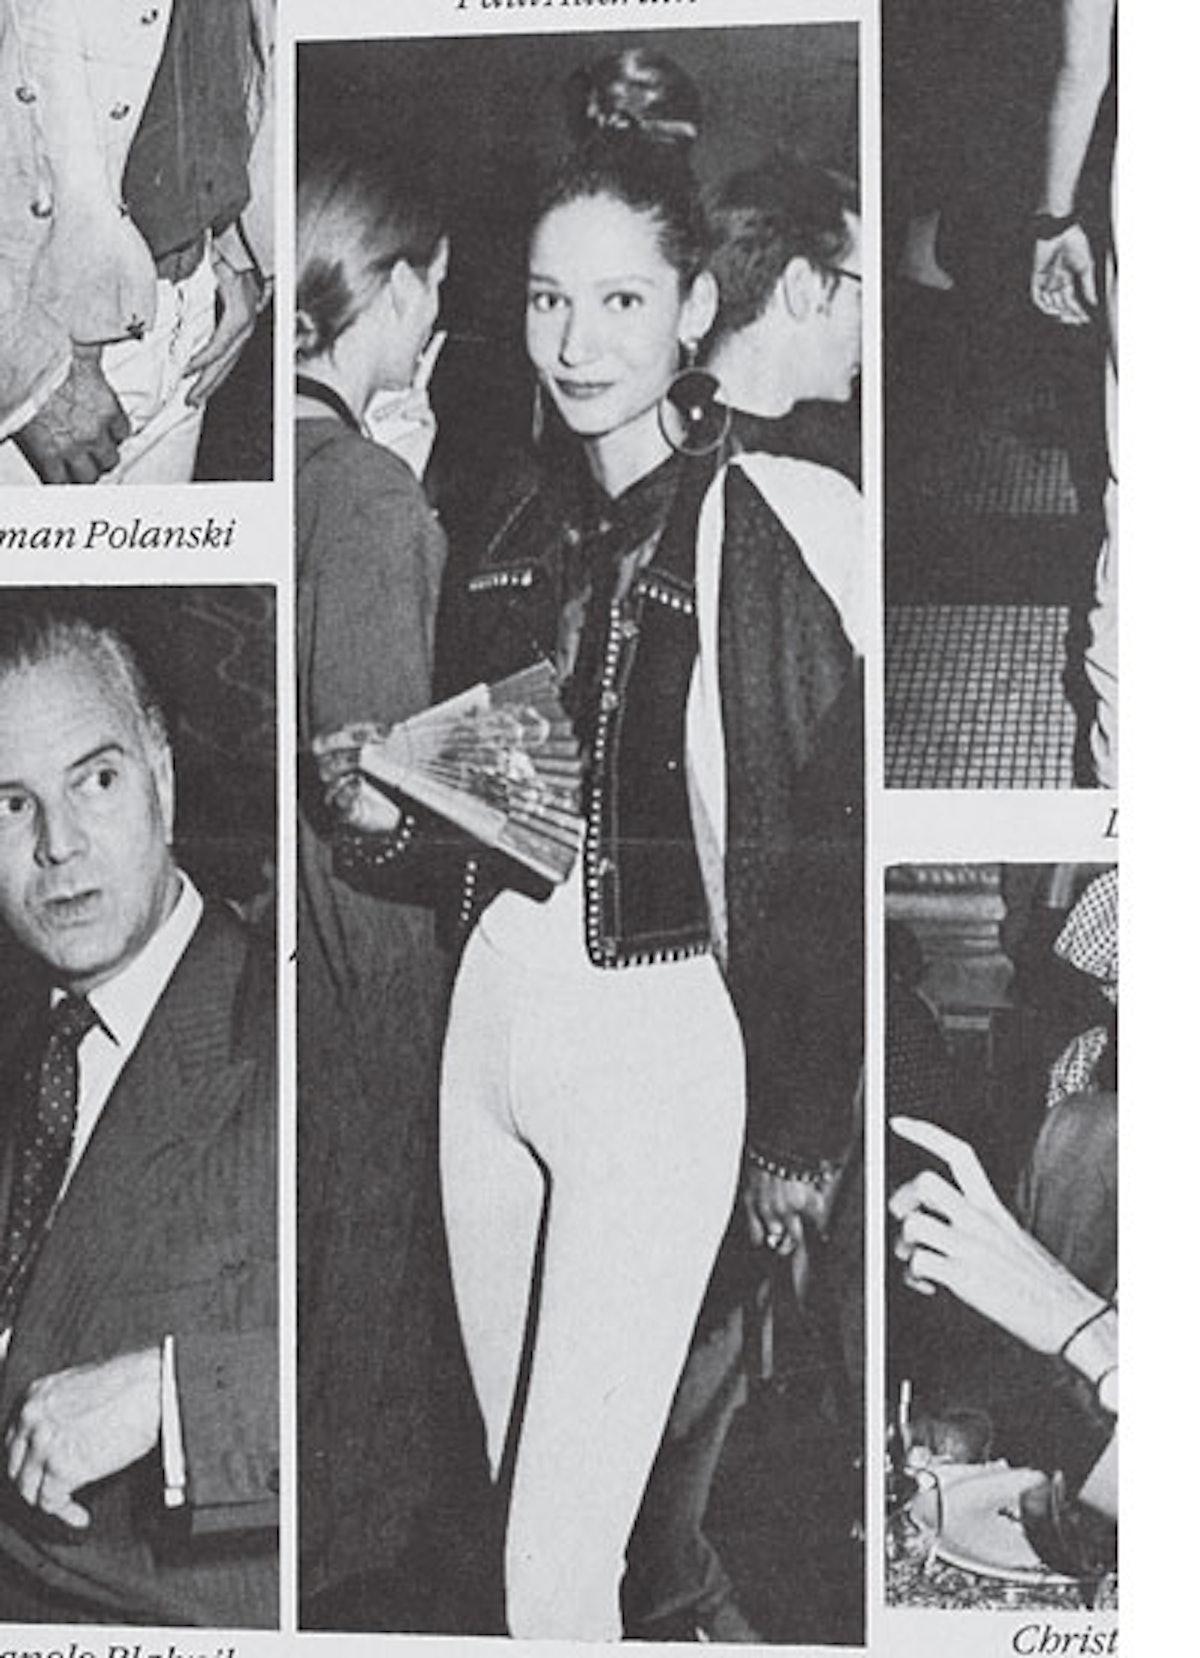 fass-w-archives-eccentrics-23-v.jpg